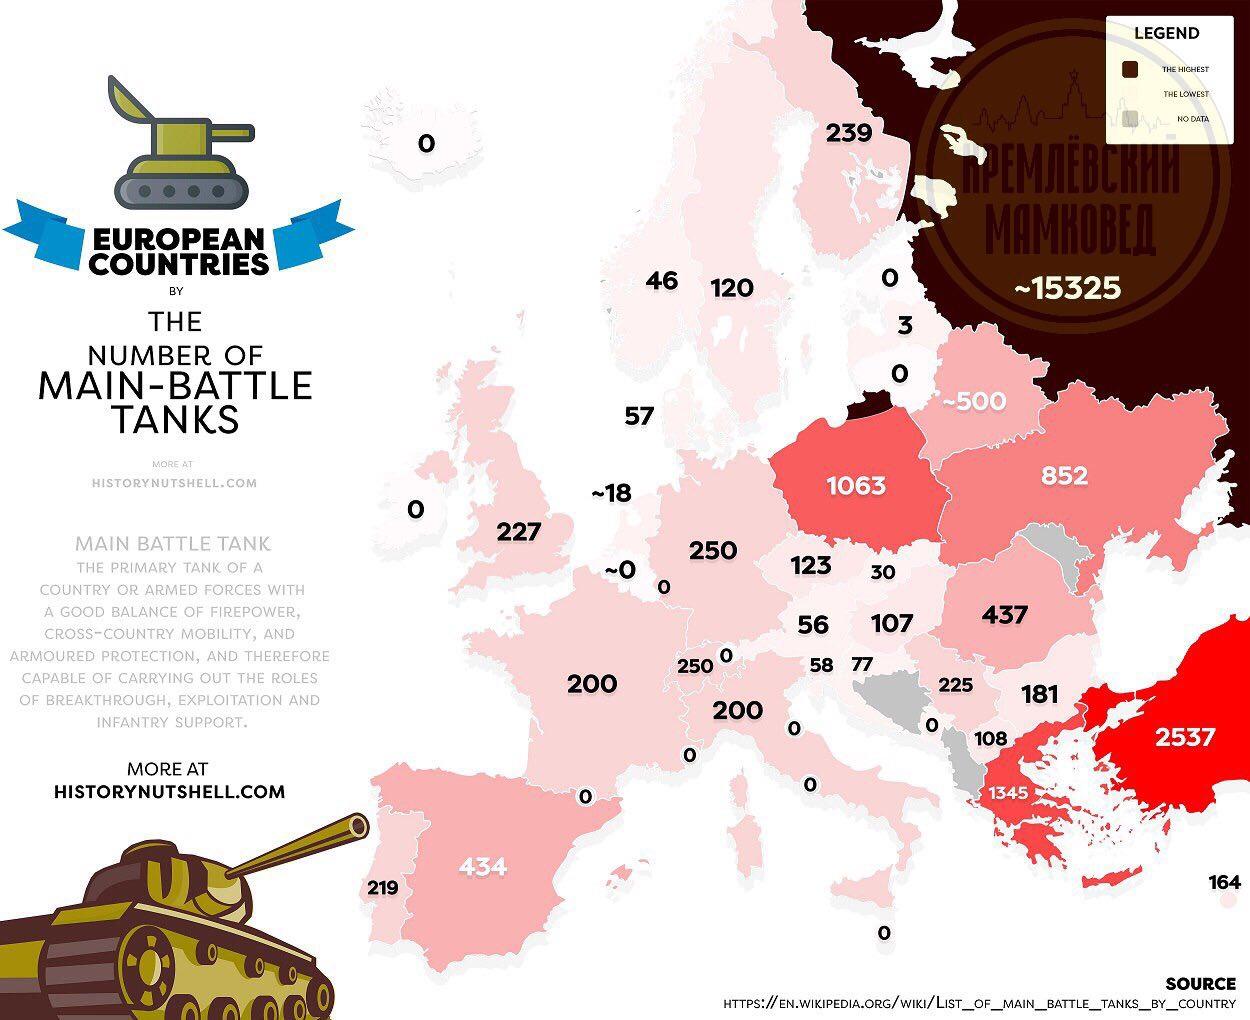 Európai szárazföldi erők - Page 2 AQIcnb3-2i0